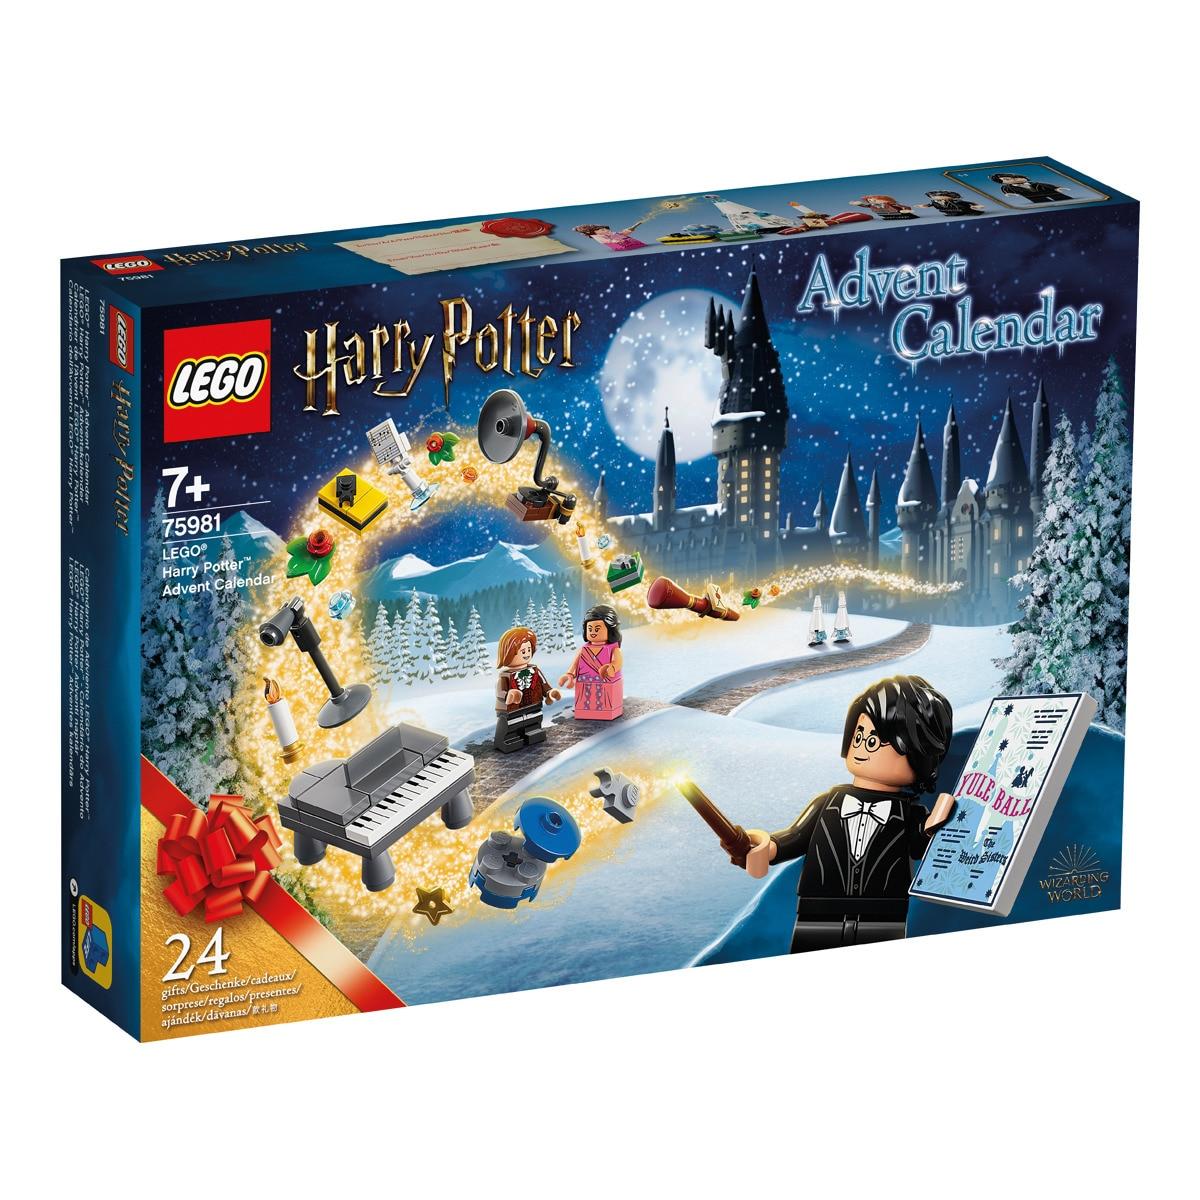 Calendario de adviento de Lego Harry Potter